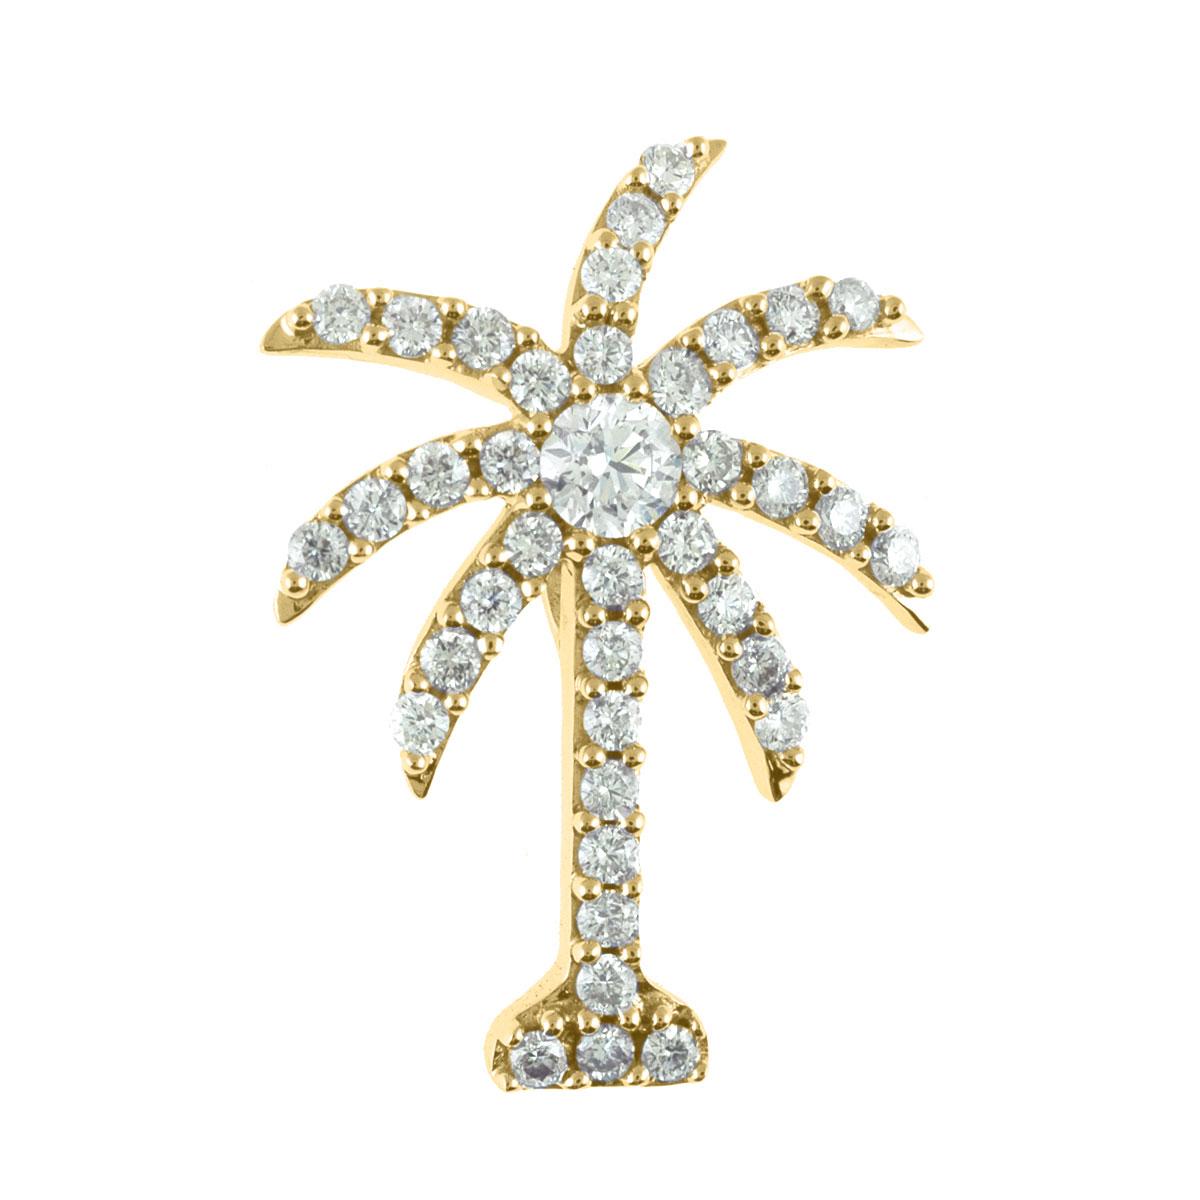 1.00 ct diamond palm tree shaped pendant set in 14k yellow gold.